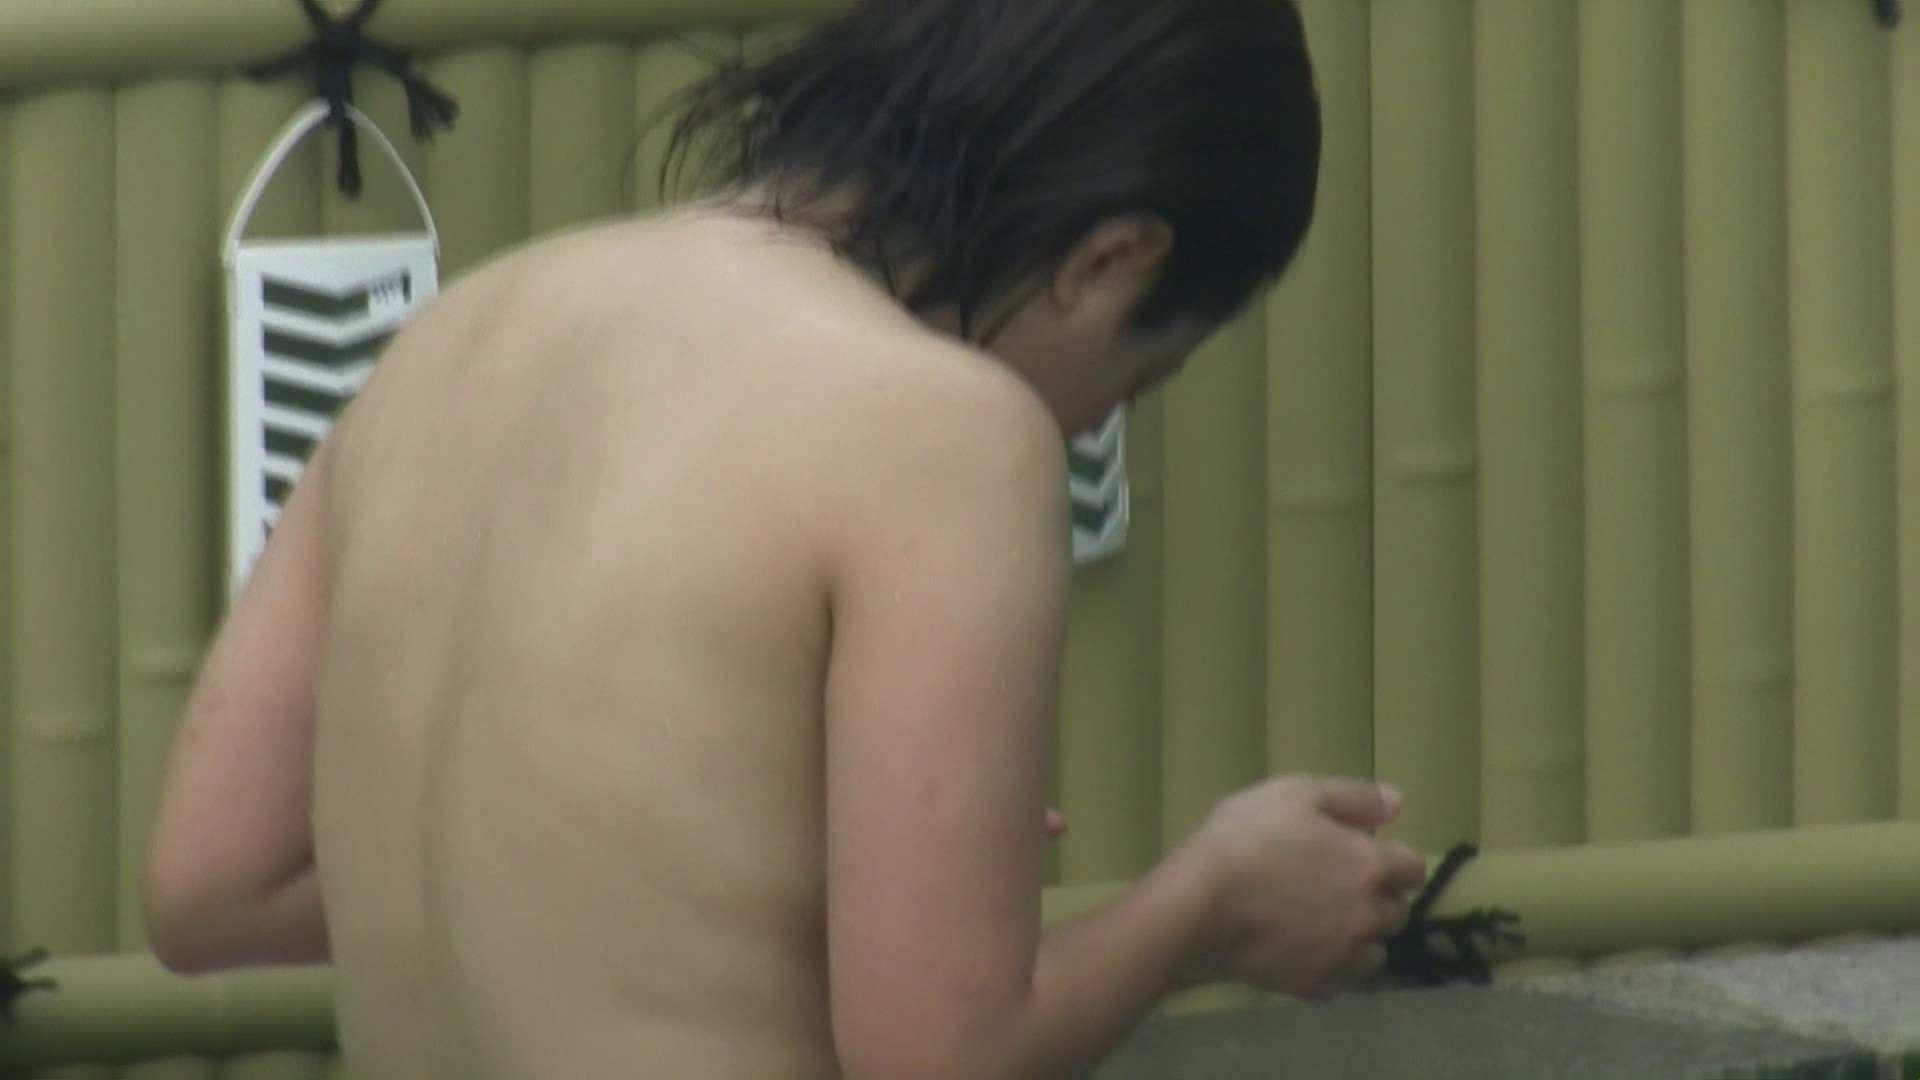 Aquaな露天風呂Vol.604 美しいOLの裸体 AV無料 78pic 65